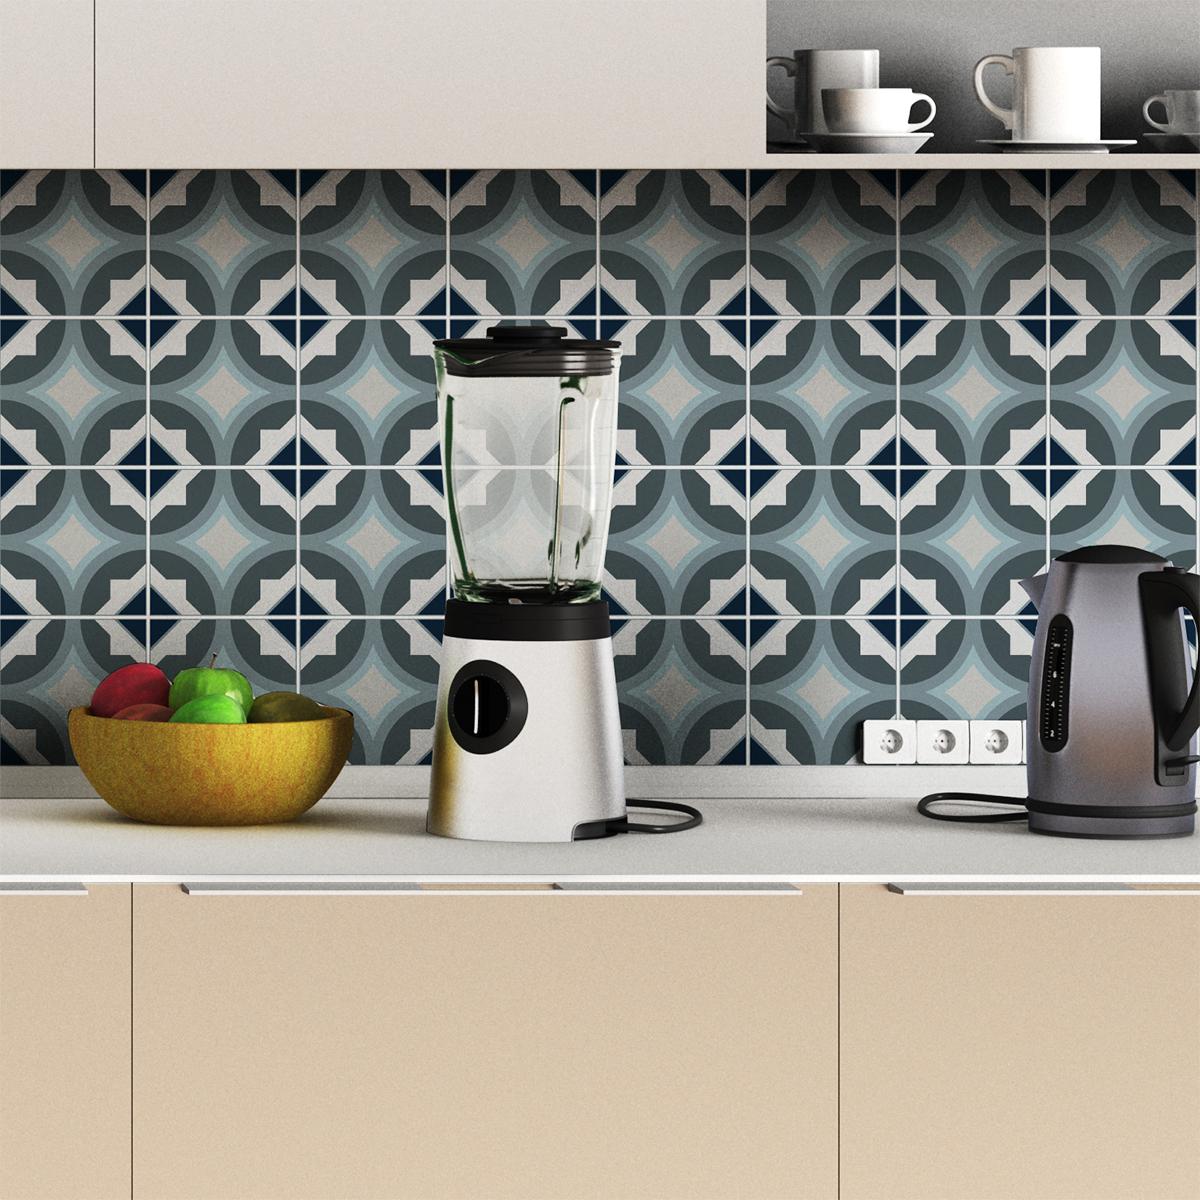 24 stickers carrelages azulejos georgetta cuisine - Stickers cuisine carrelage ...